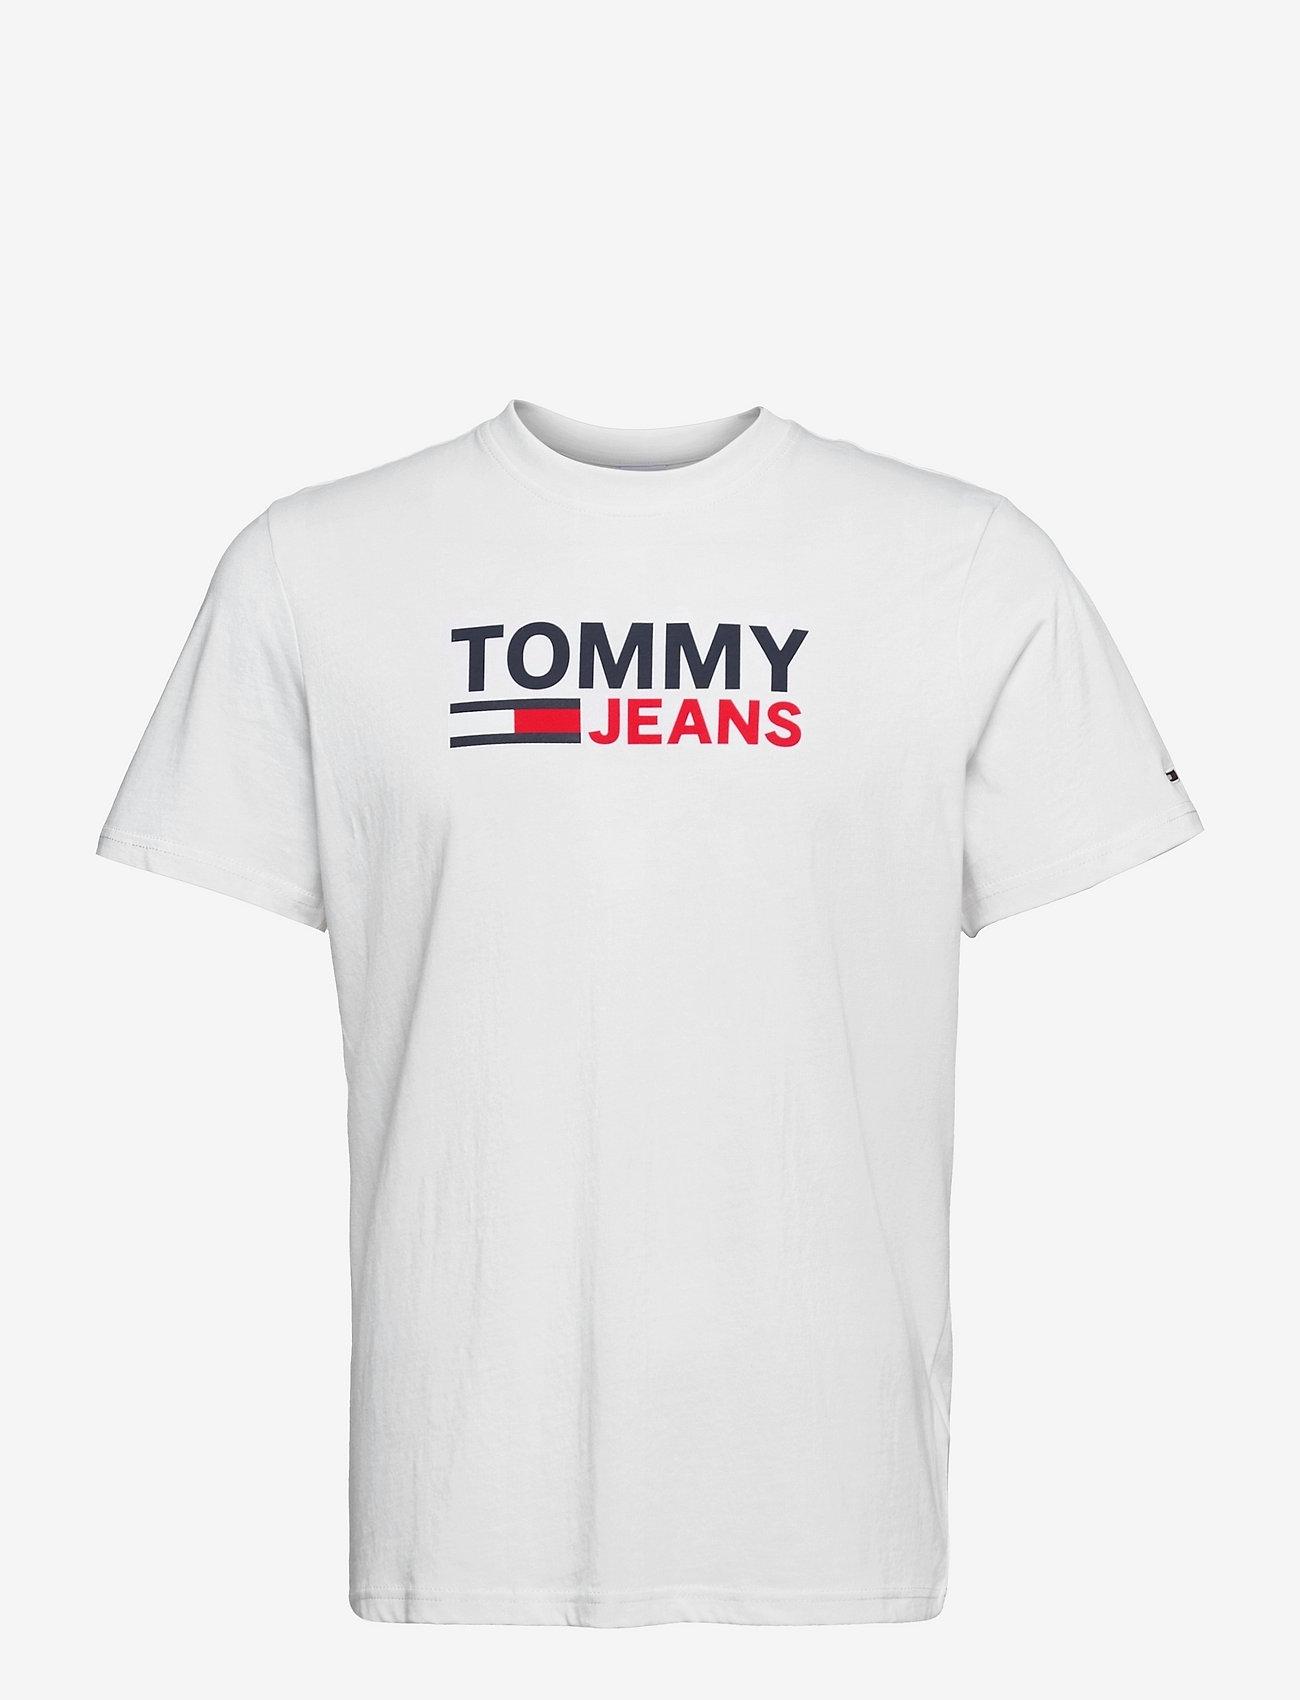 Tommy Jeans - TJM CORP LOGO TEE - kortärmade t-shirts - white - 0